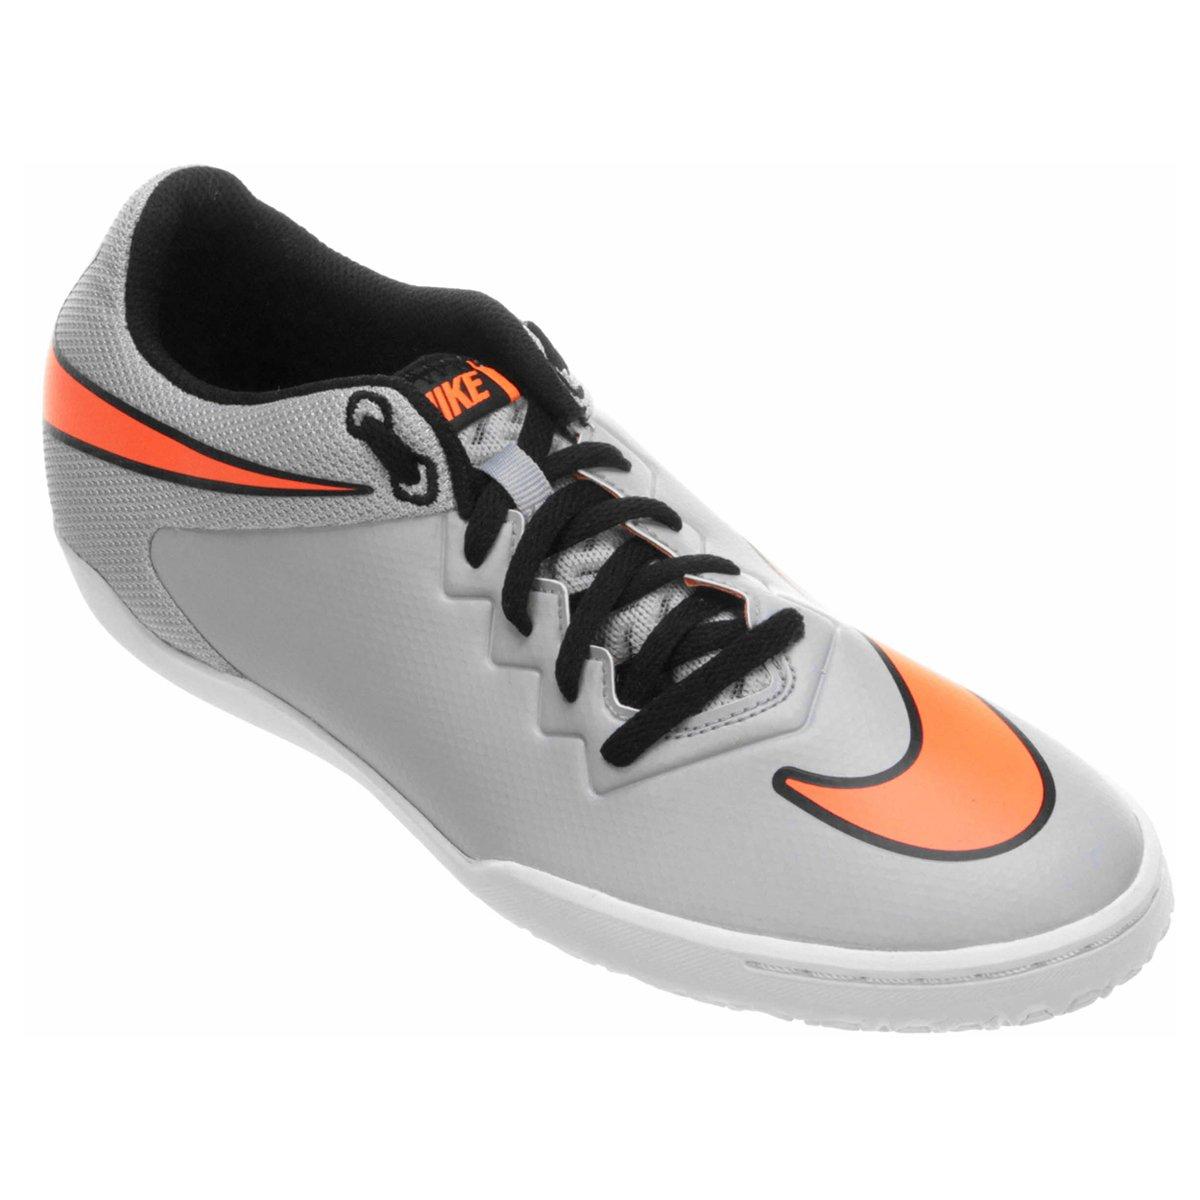 c80b8c185f Chuteira Futsal Nike Hypervenom Pro IC Masculina - Compre Agora ...